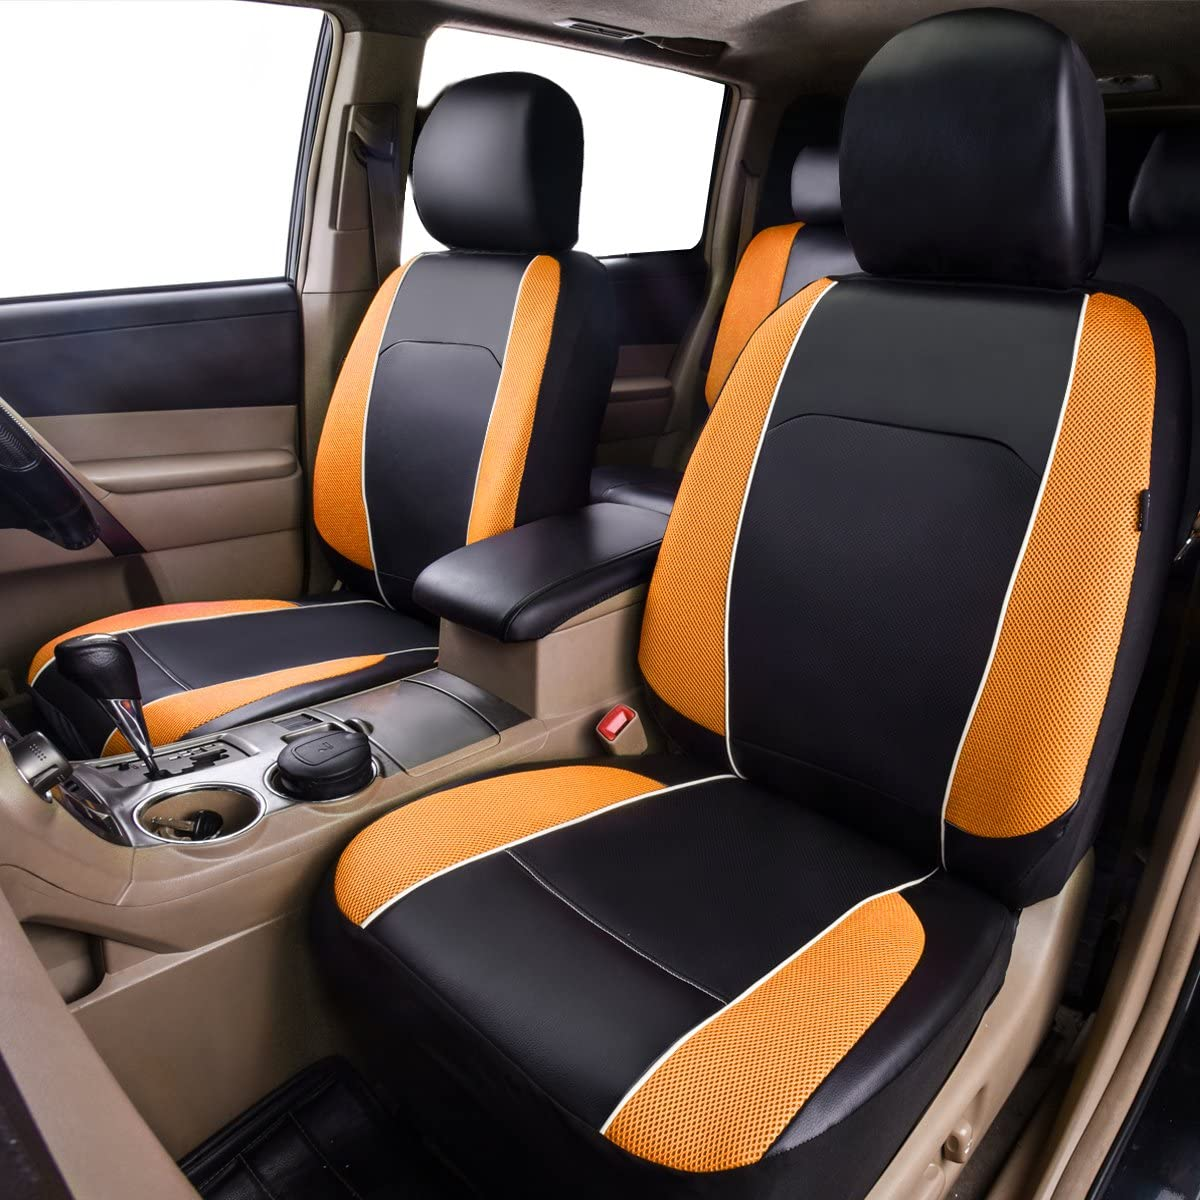 CAR PASS Univesal Coche Fundas para asientos frontales Airbag Compatible de piel sint/ética transpirable